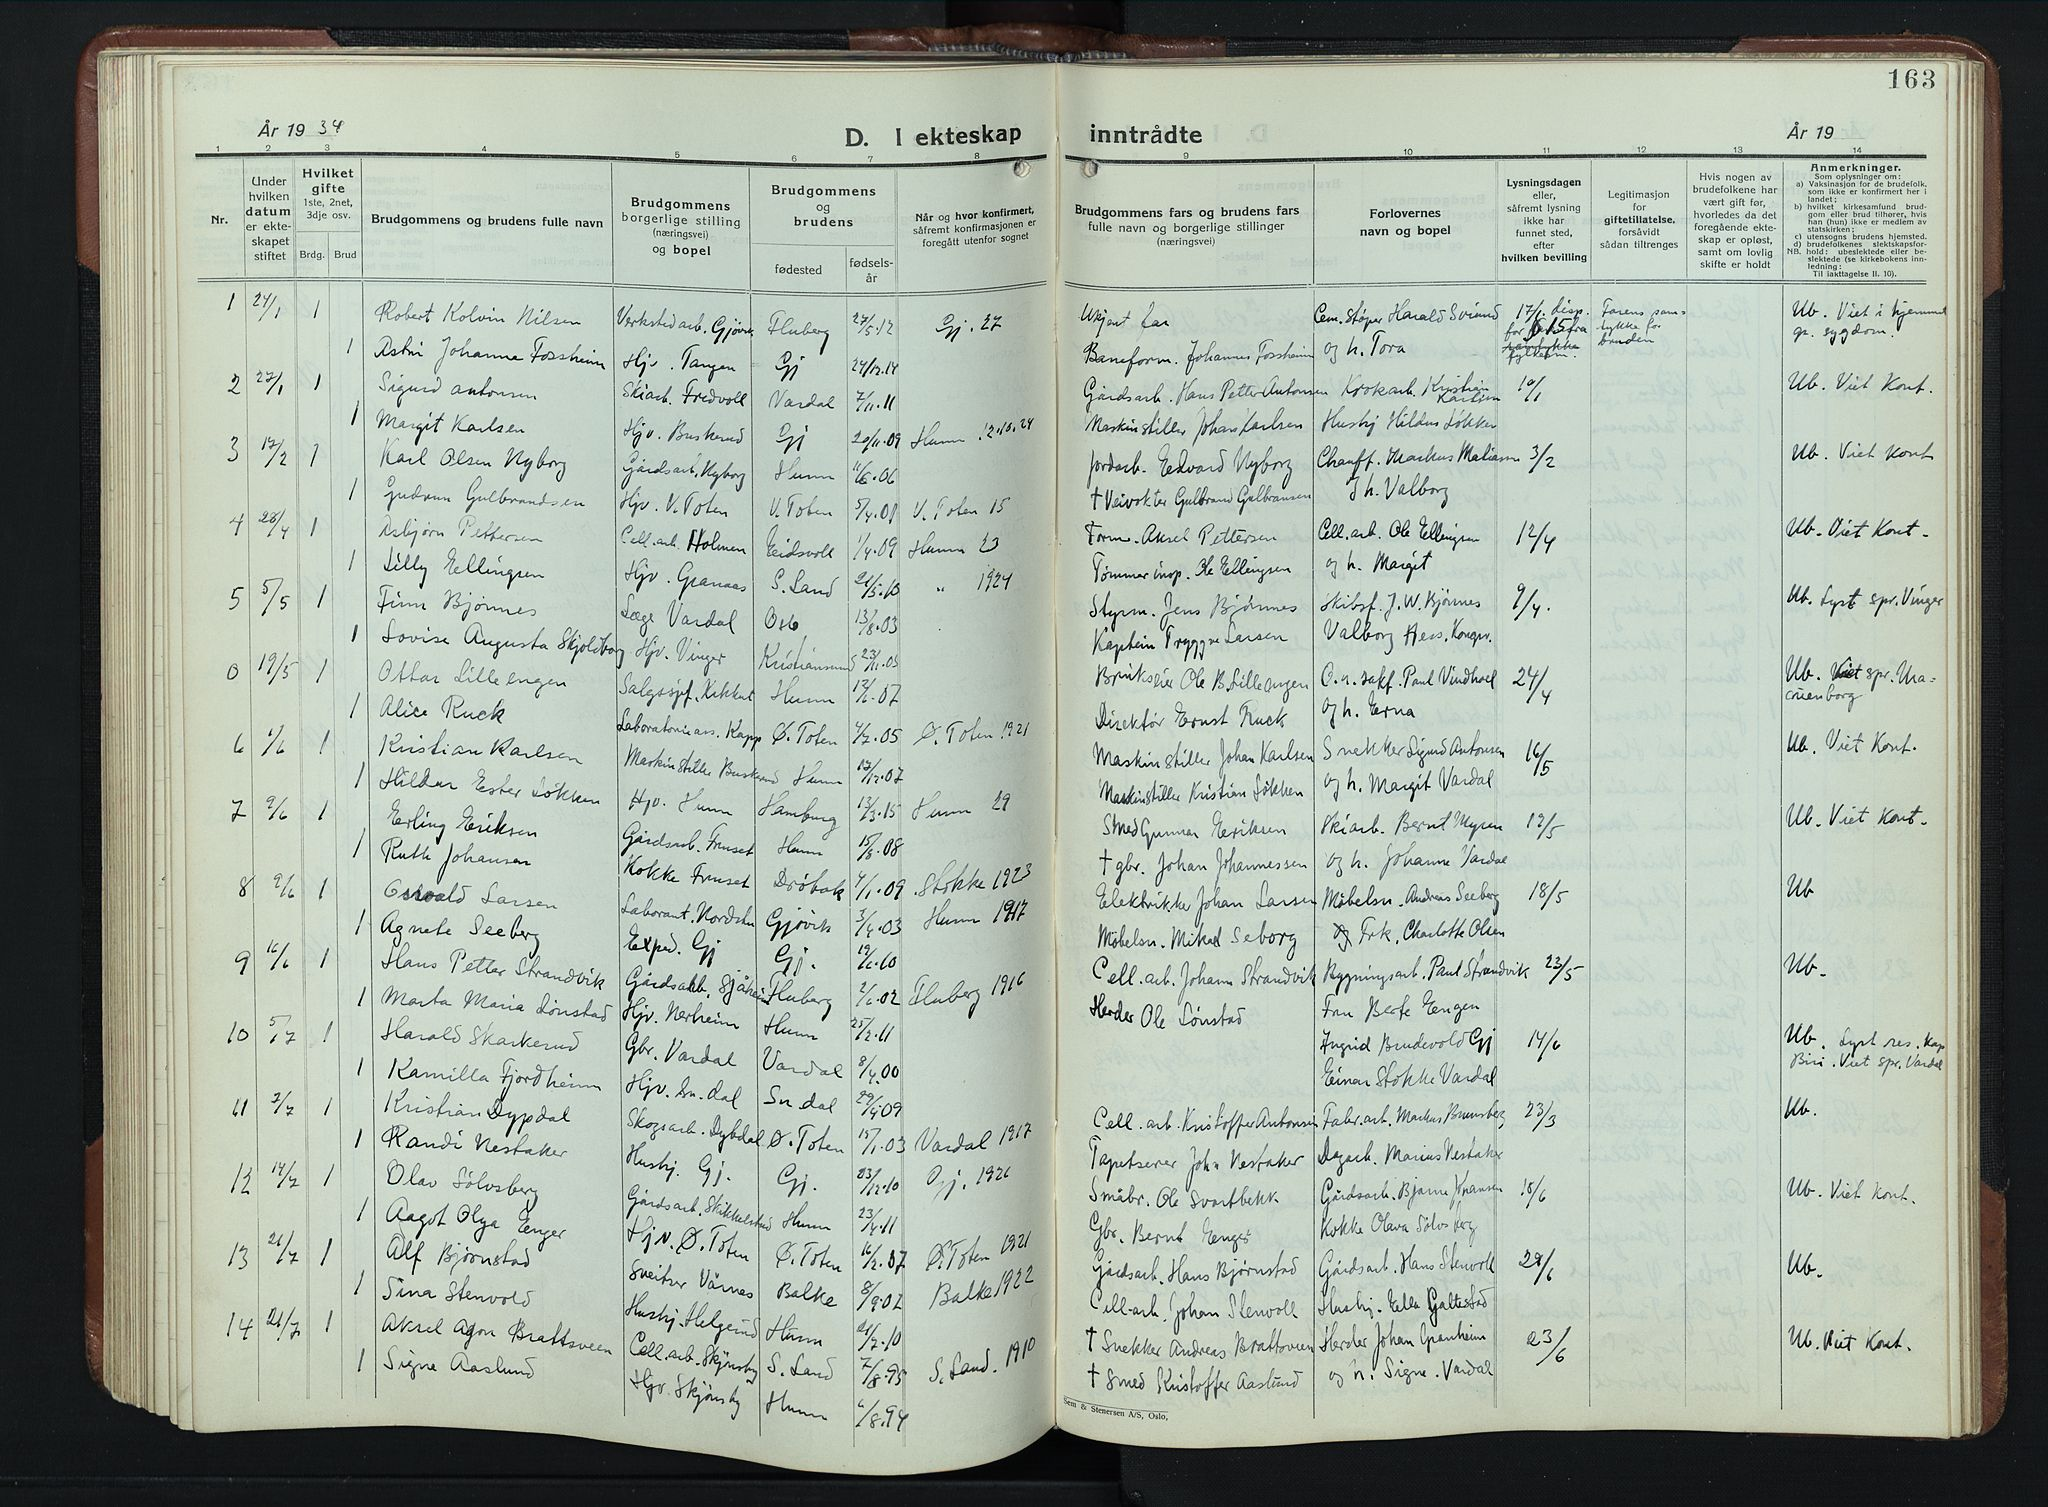 SAH, Vardal prestekontor, H/Ha/Hab/L0023: Klokkerbok nr. 23, 1929-1941, s. 163